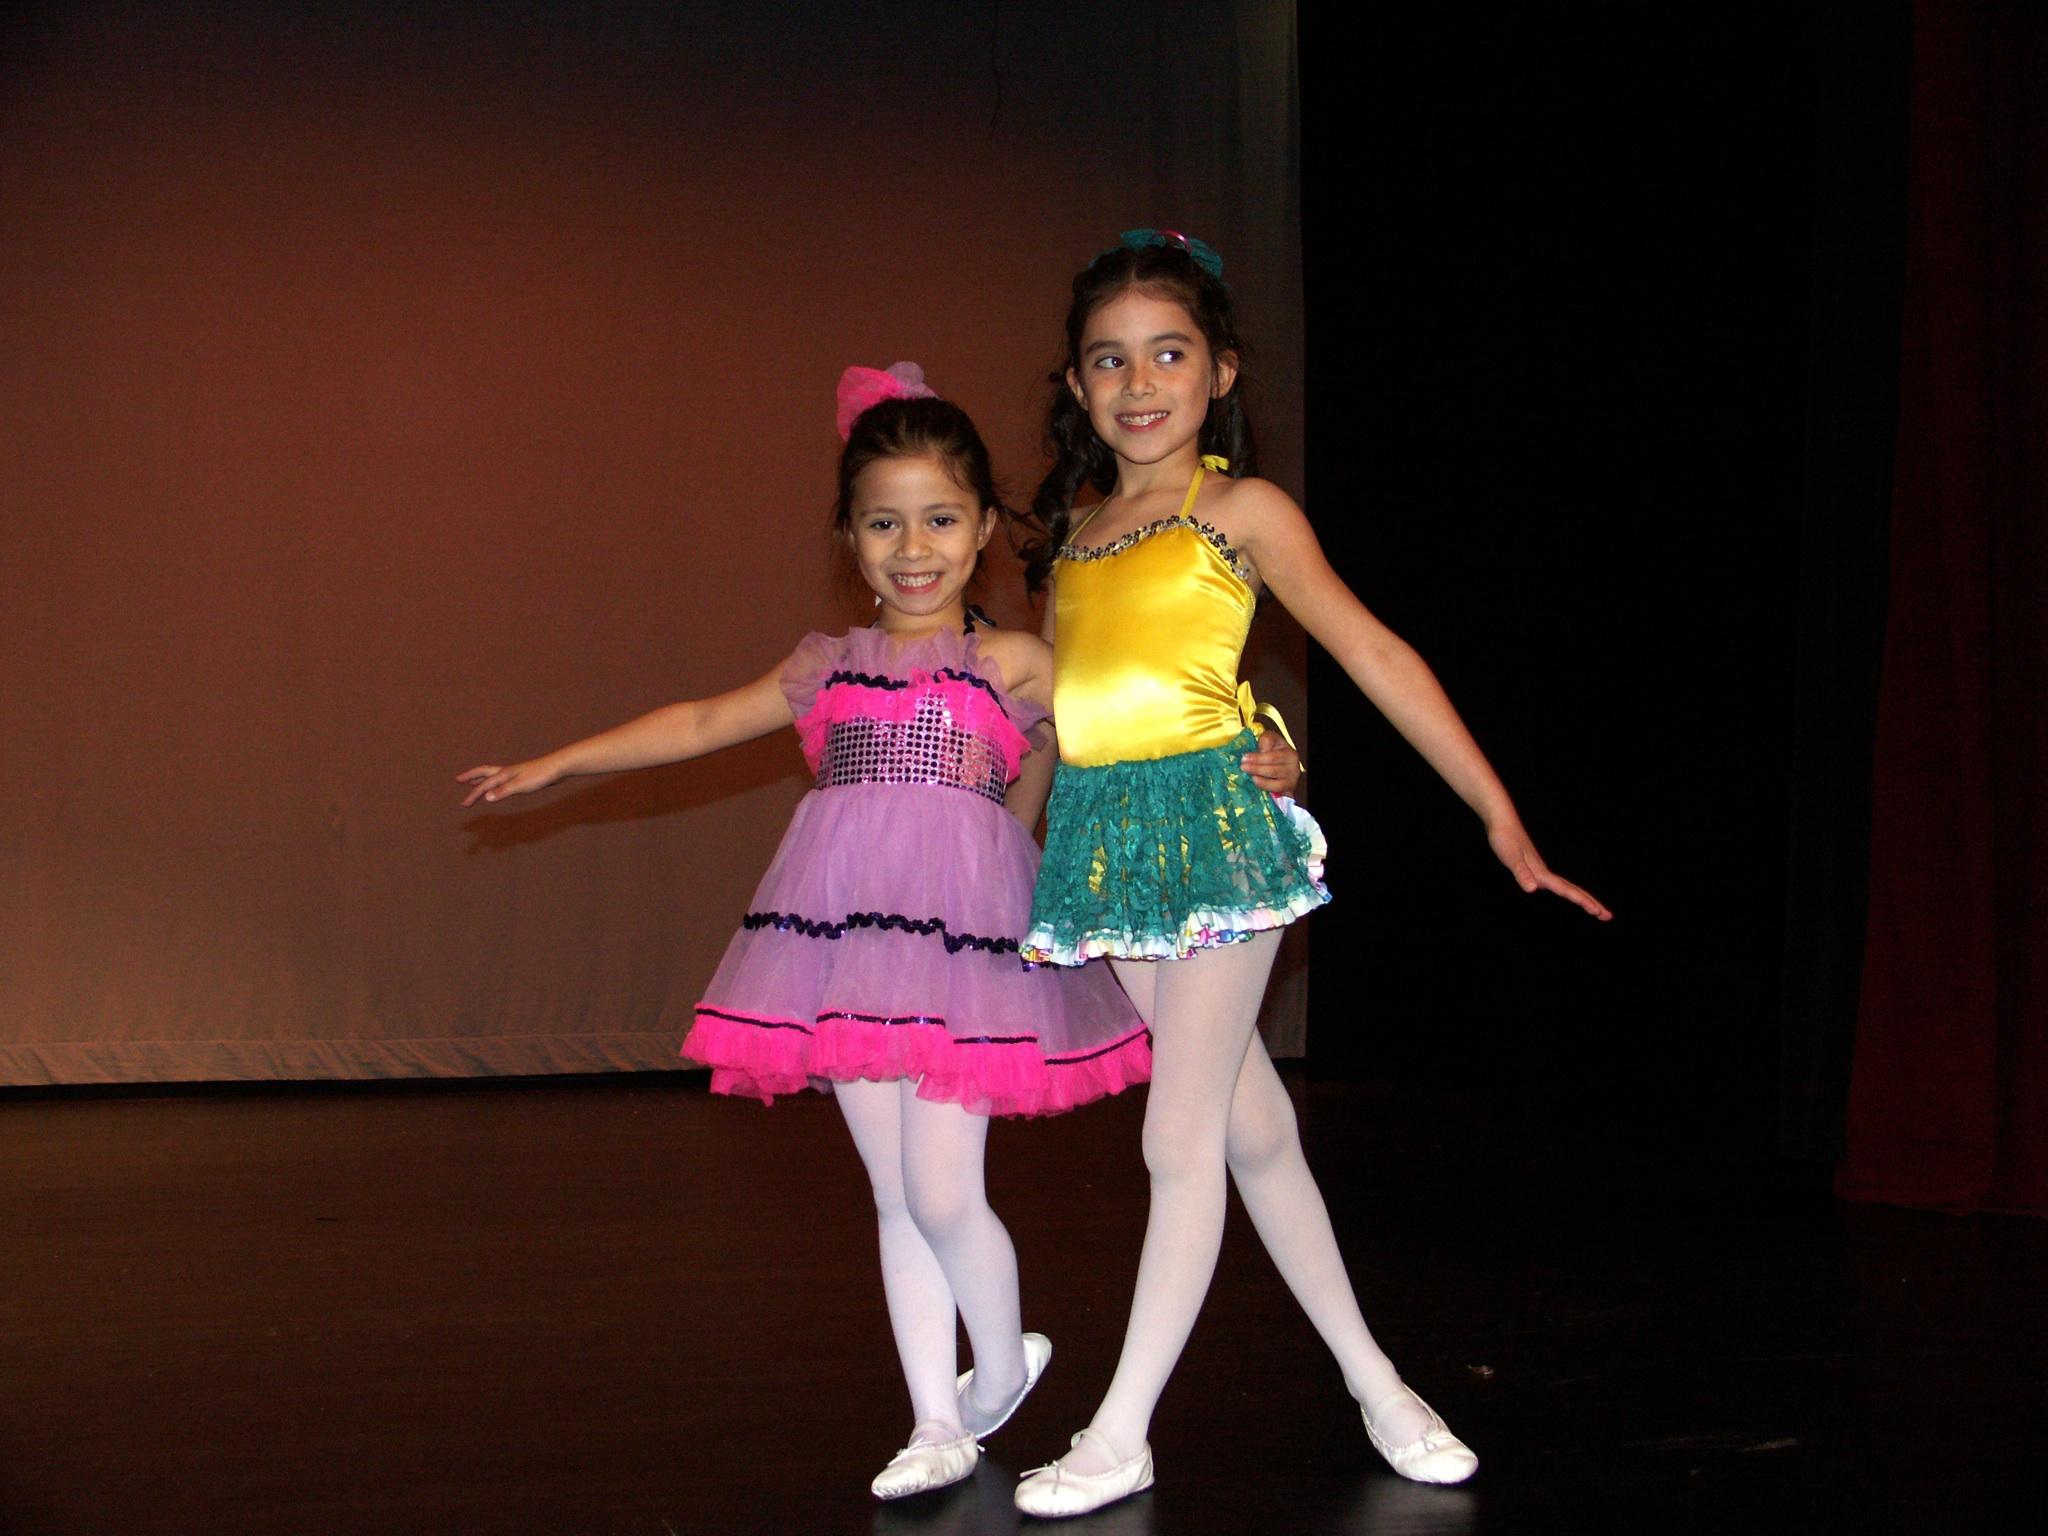 Dance Recital (2004)